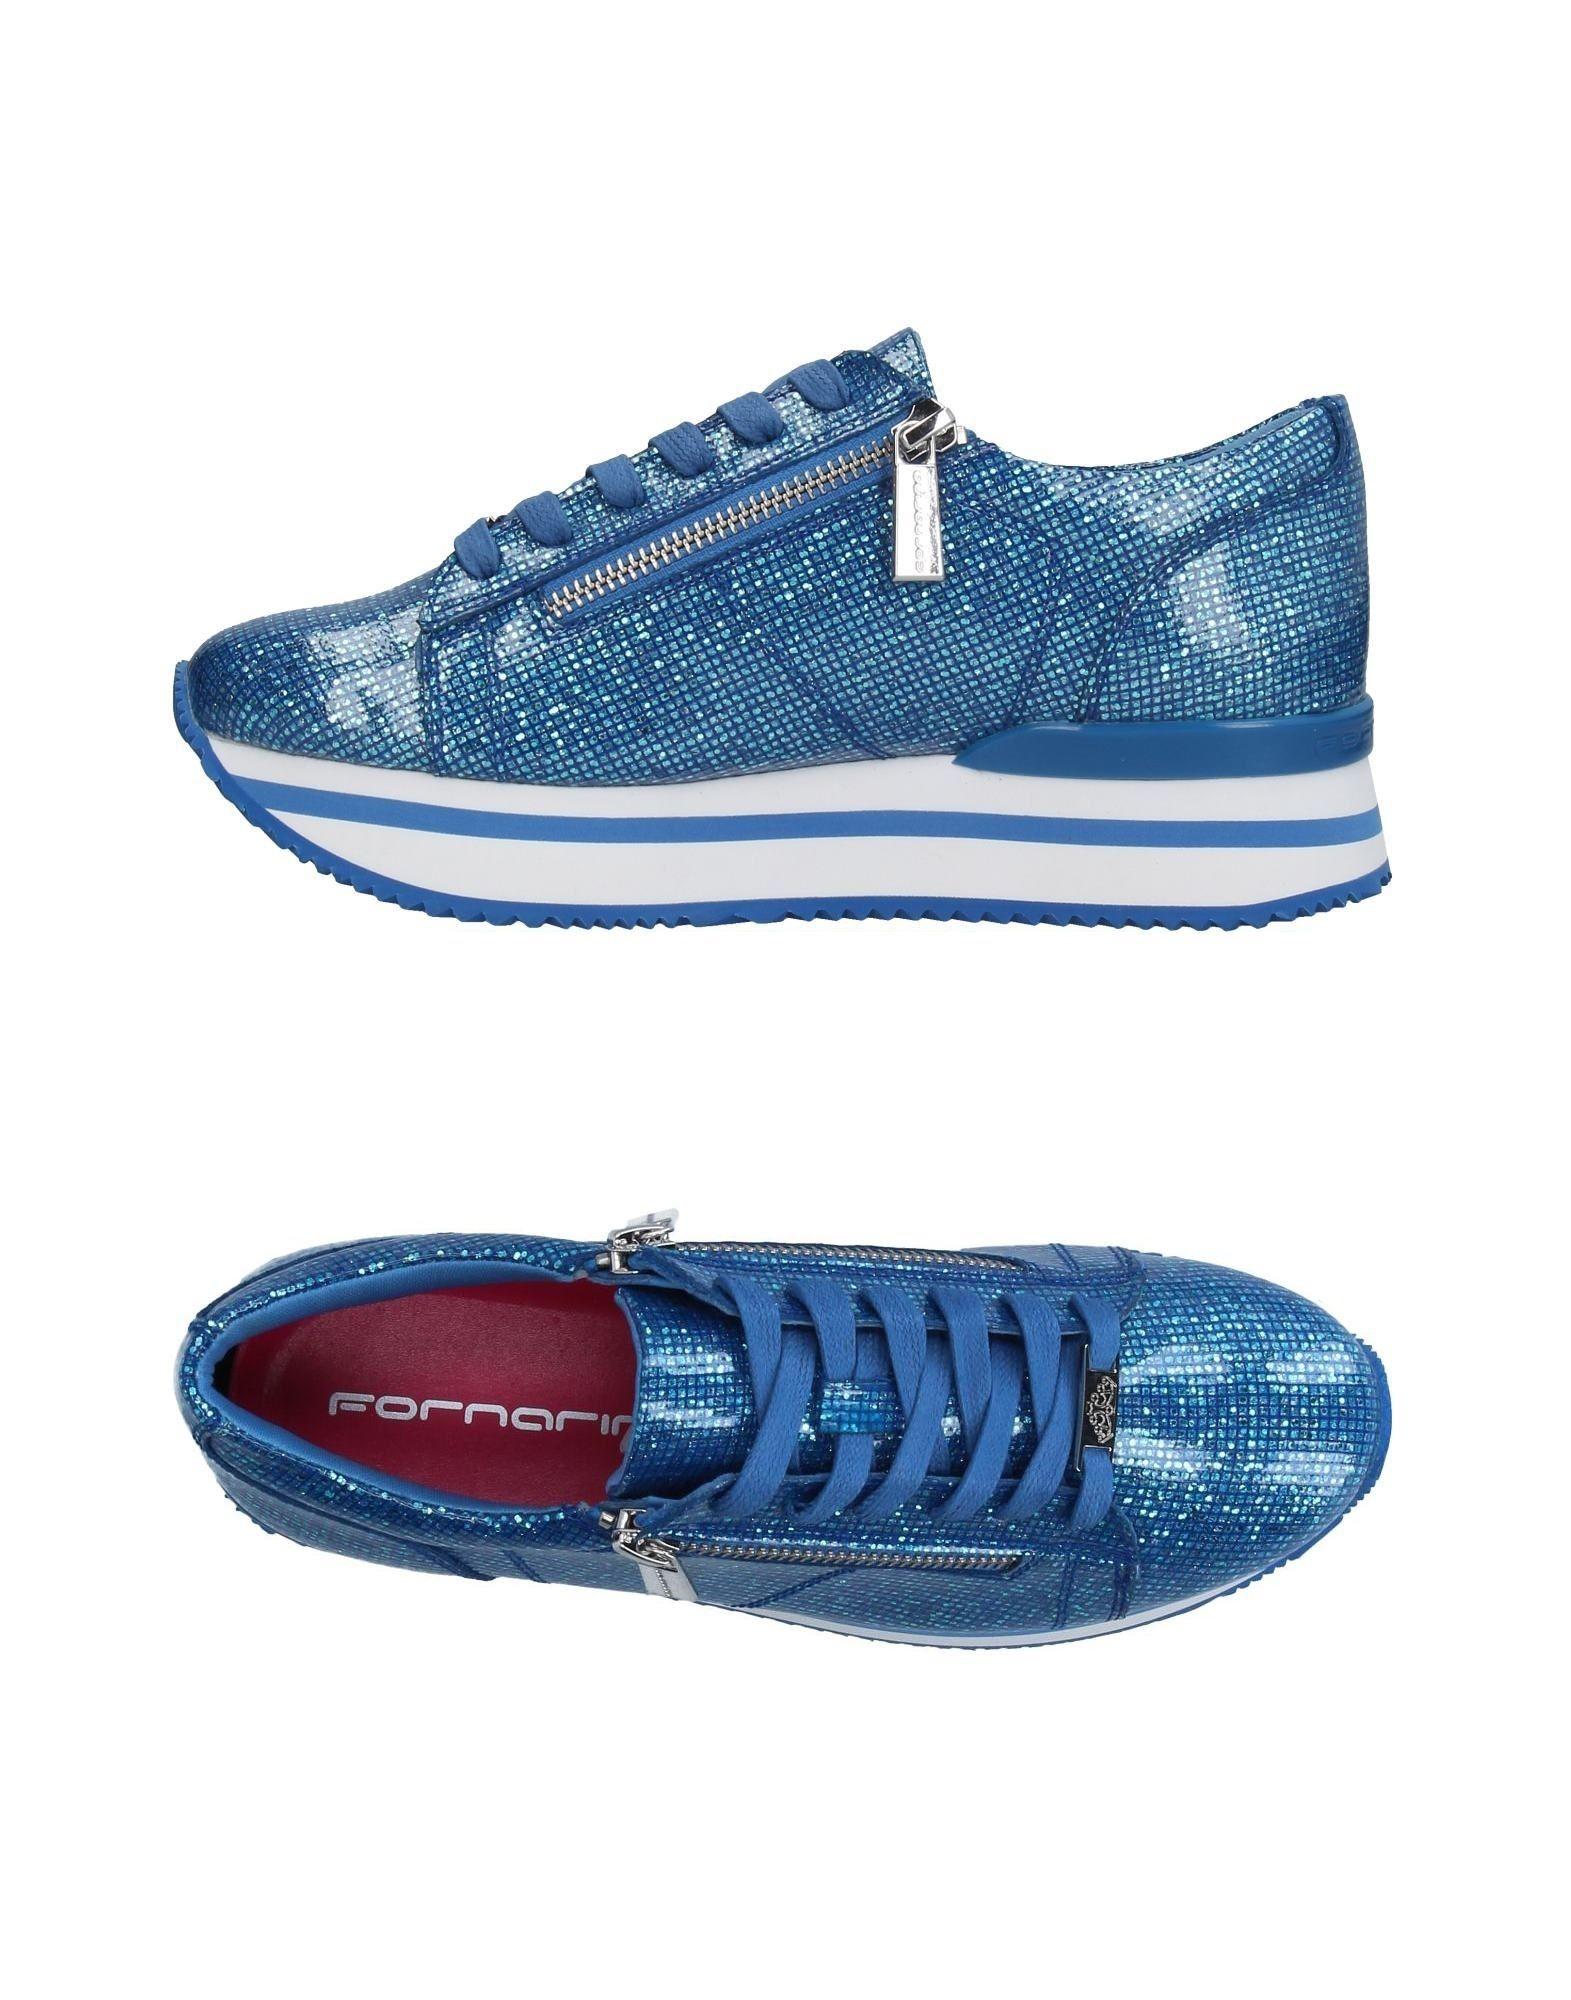 Sneakers & tennis basses fornarina femme. bleu...